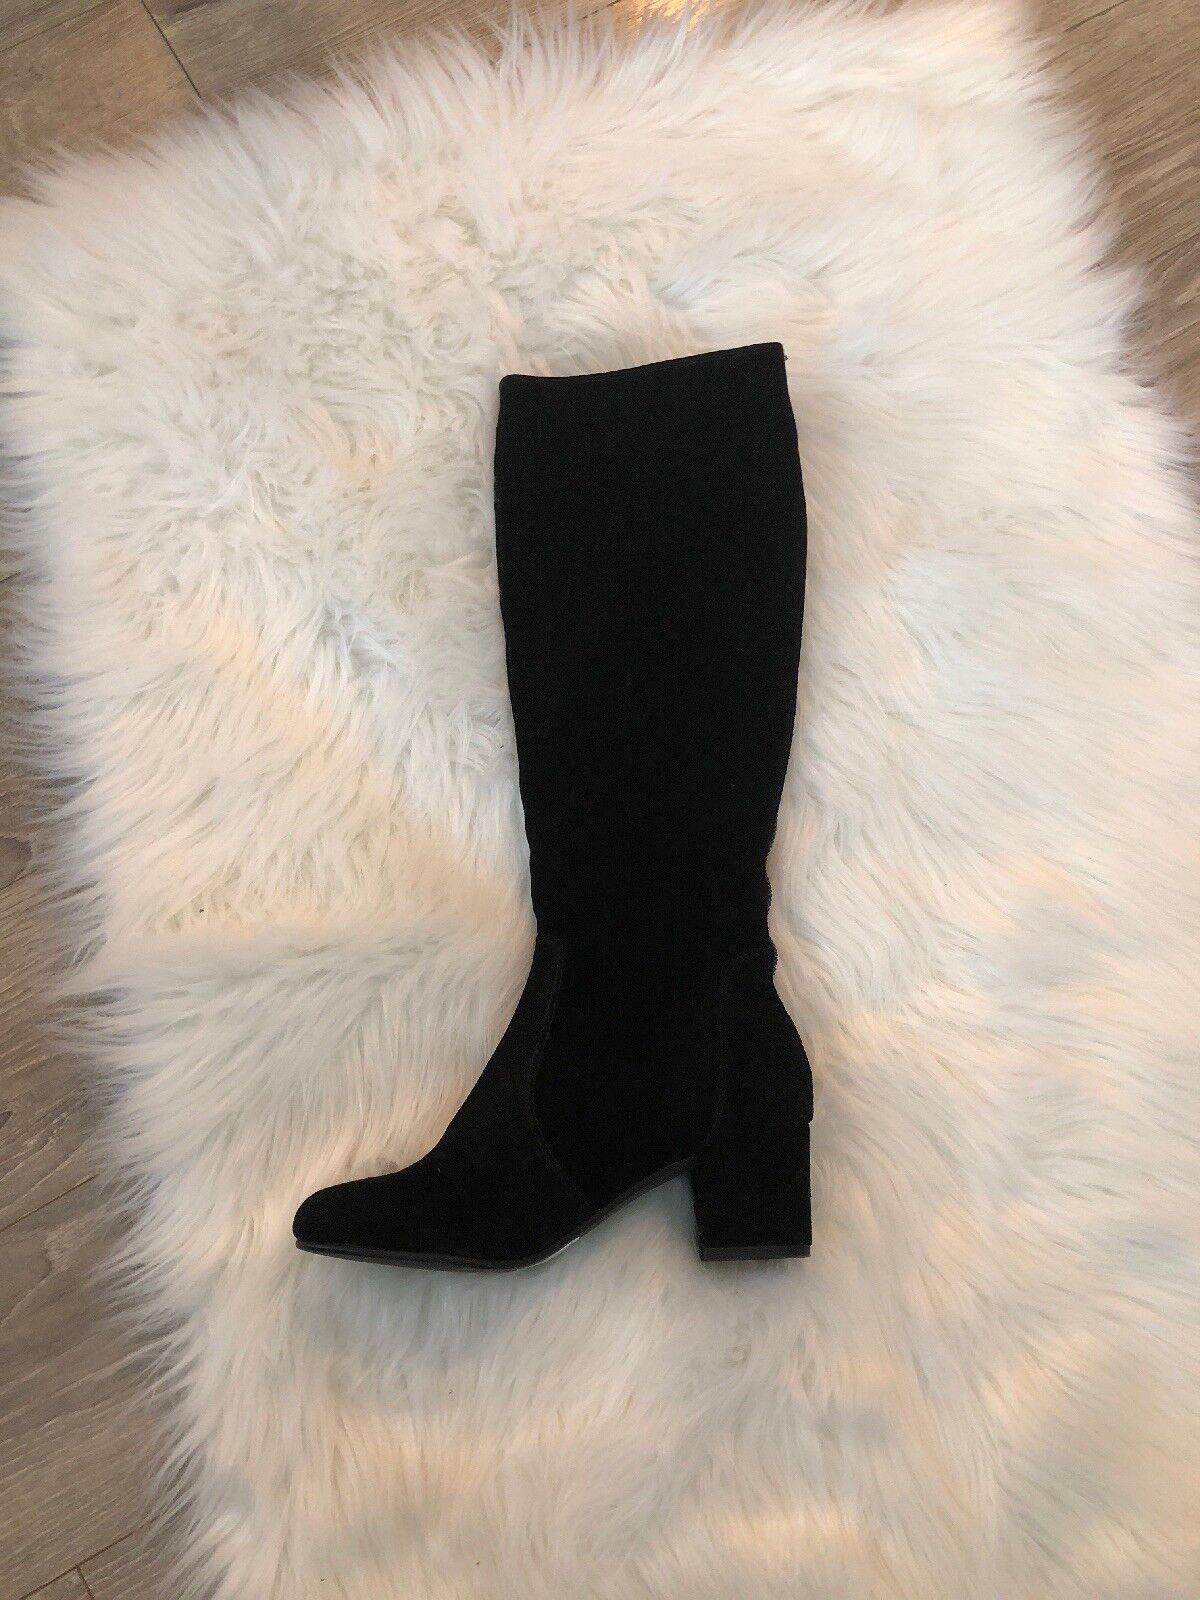 Steve Madden New New New Haydun Black Womens Boots size 8.5 c57e77